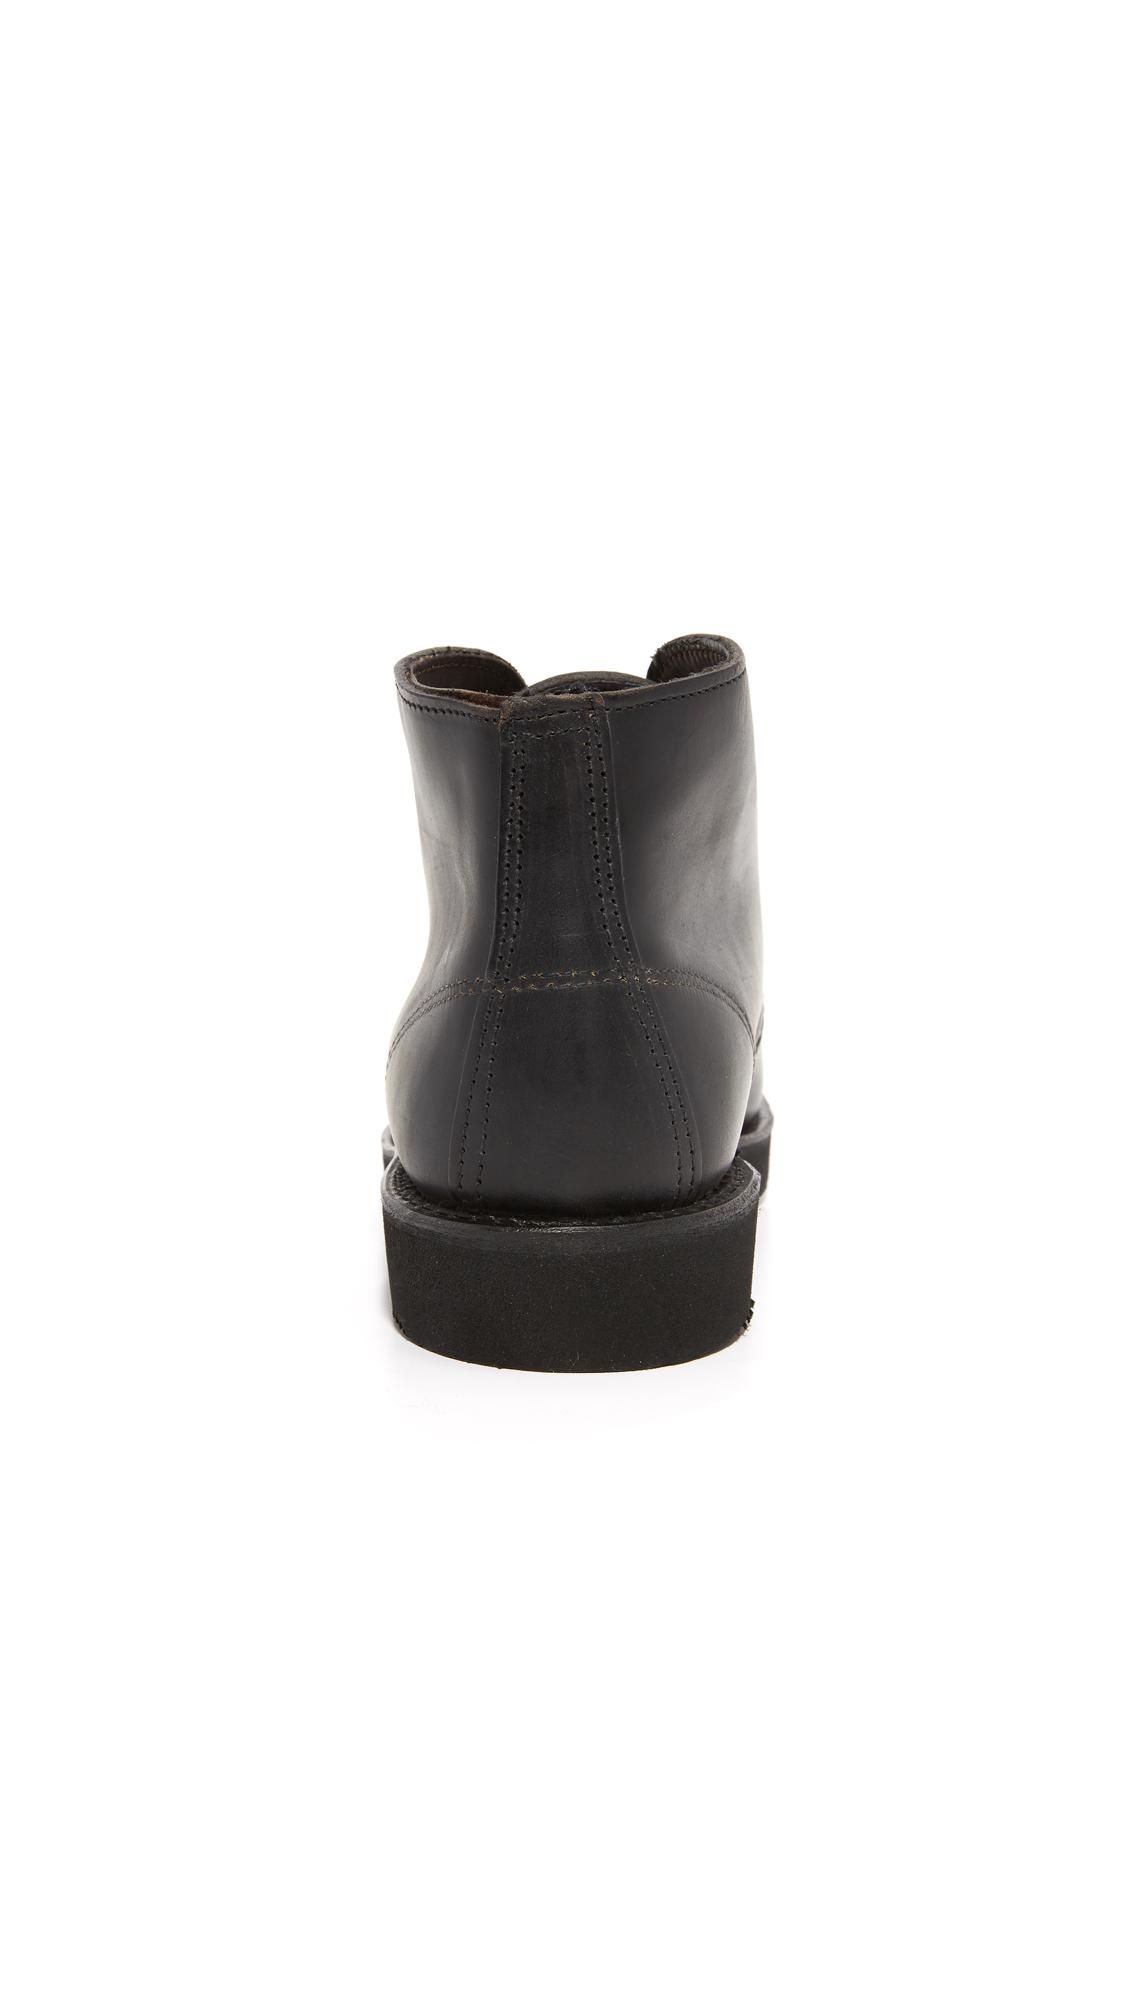 Wolverine 1000 Mile Palmer Chukka Boots East Dane D Island Shoes Slip On Dark Brown Leather